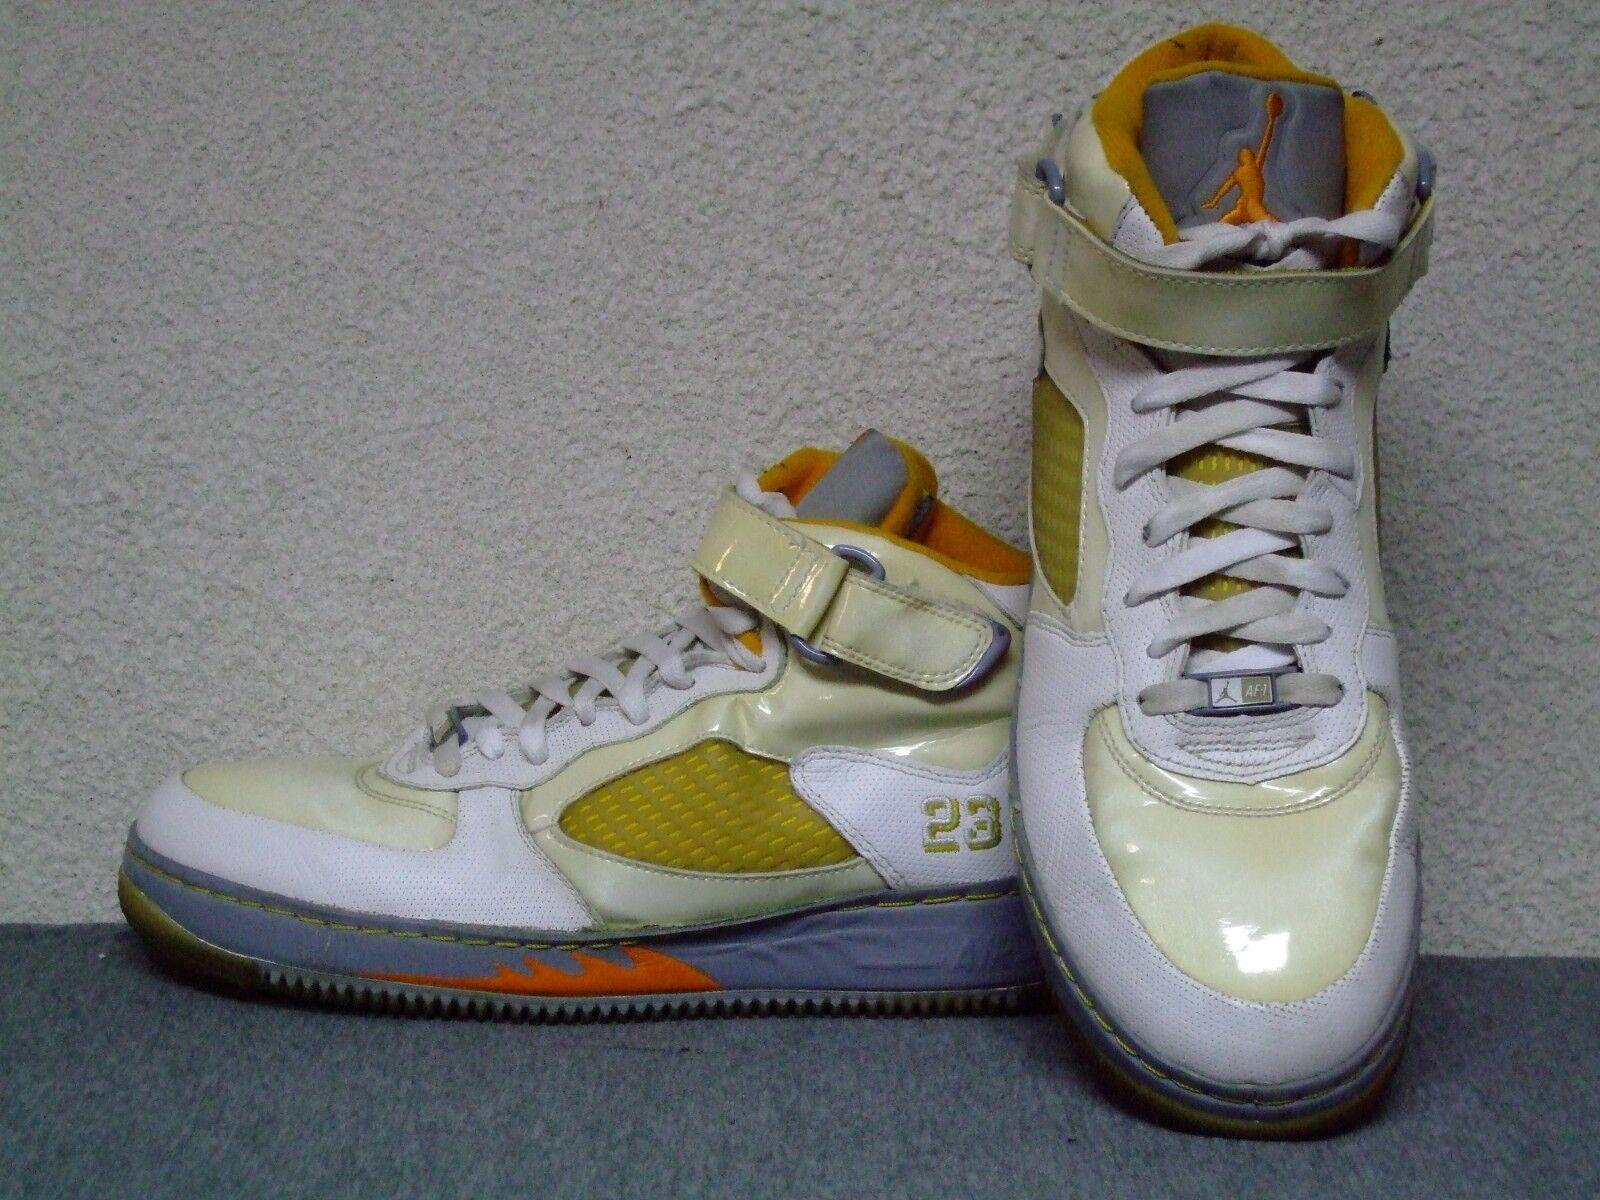 Nike Air Jordan Fusion AJF 5 white orange basketball shoes 318608-181 size 11